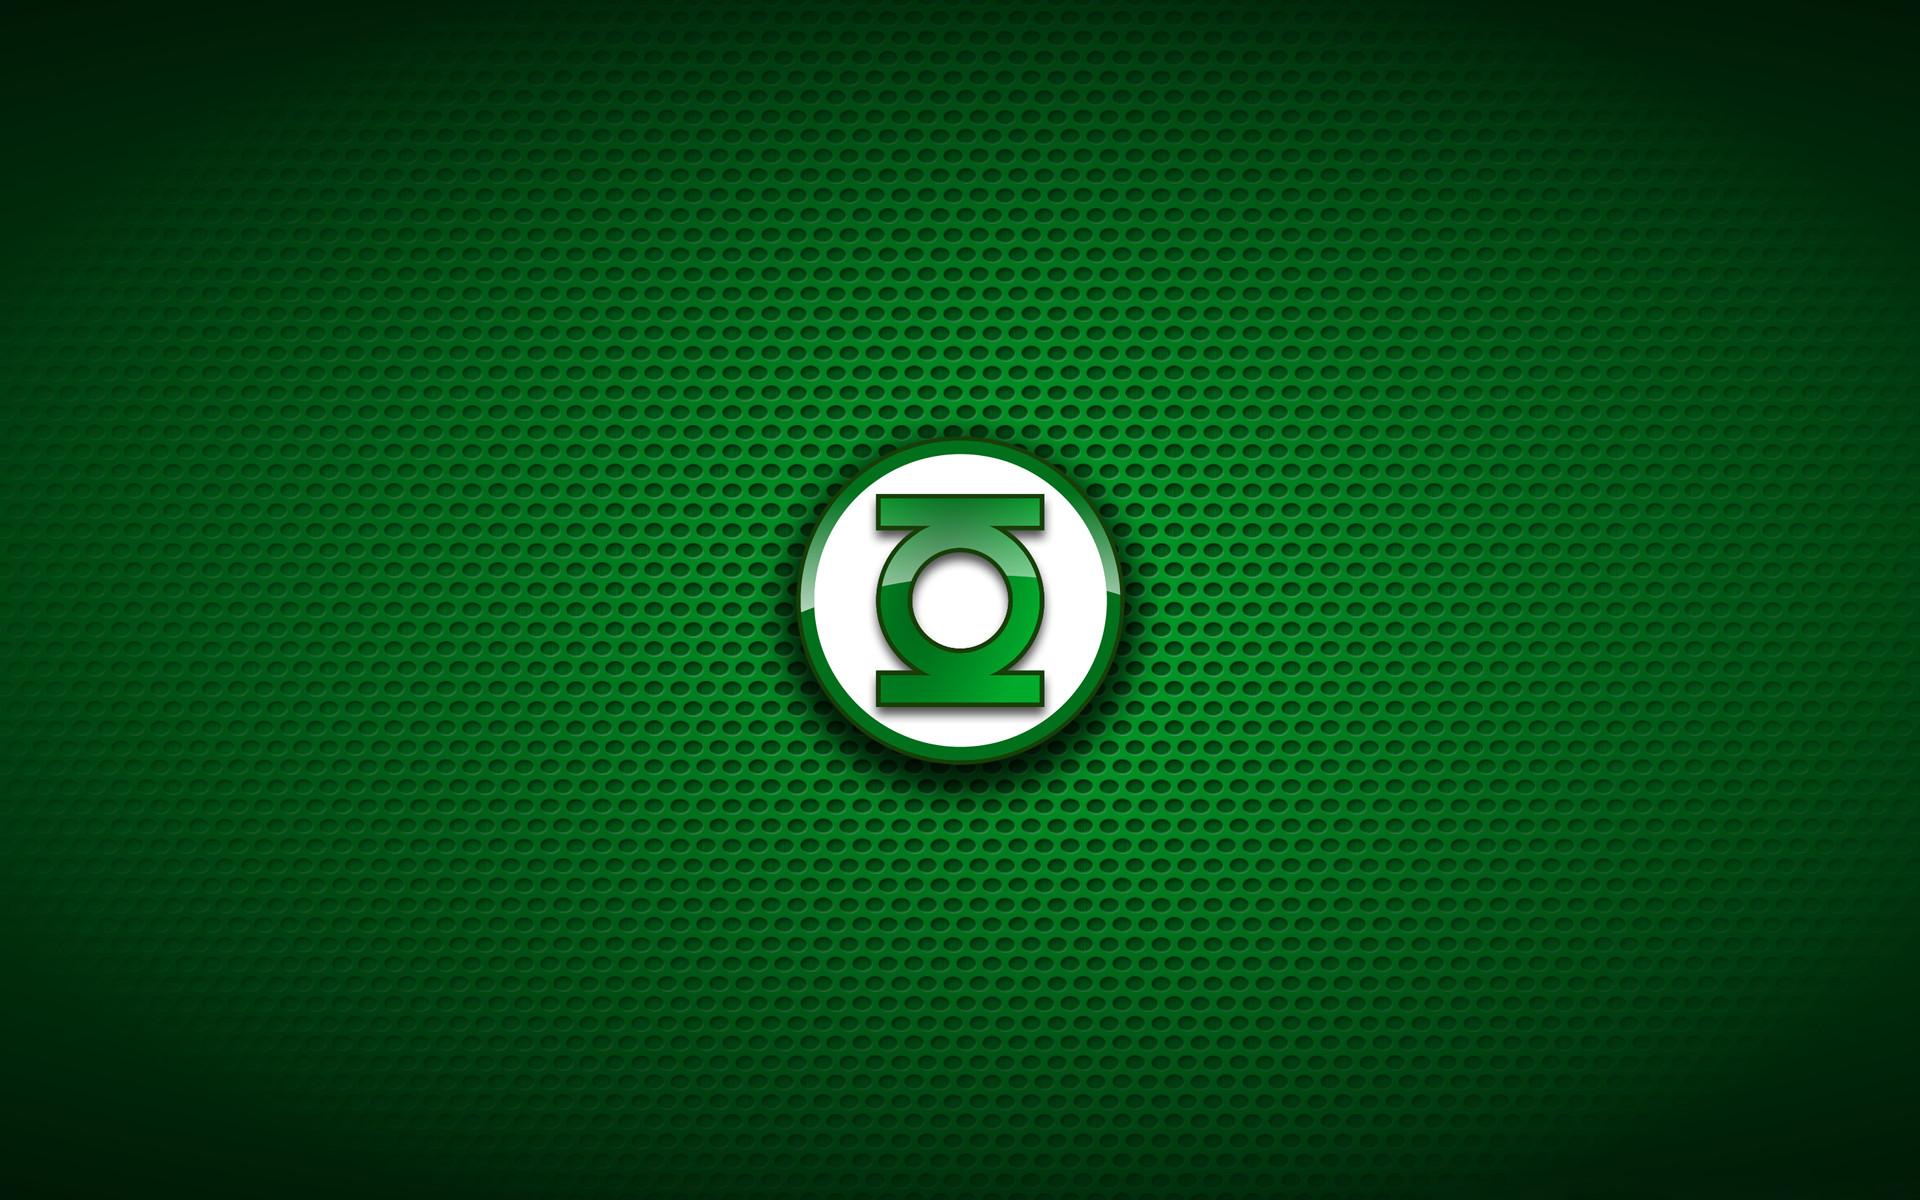 1920x1200 Comics Green Lantern Logos Marvel Superheroes HD Wallpaper